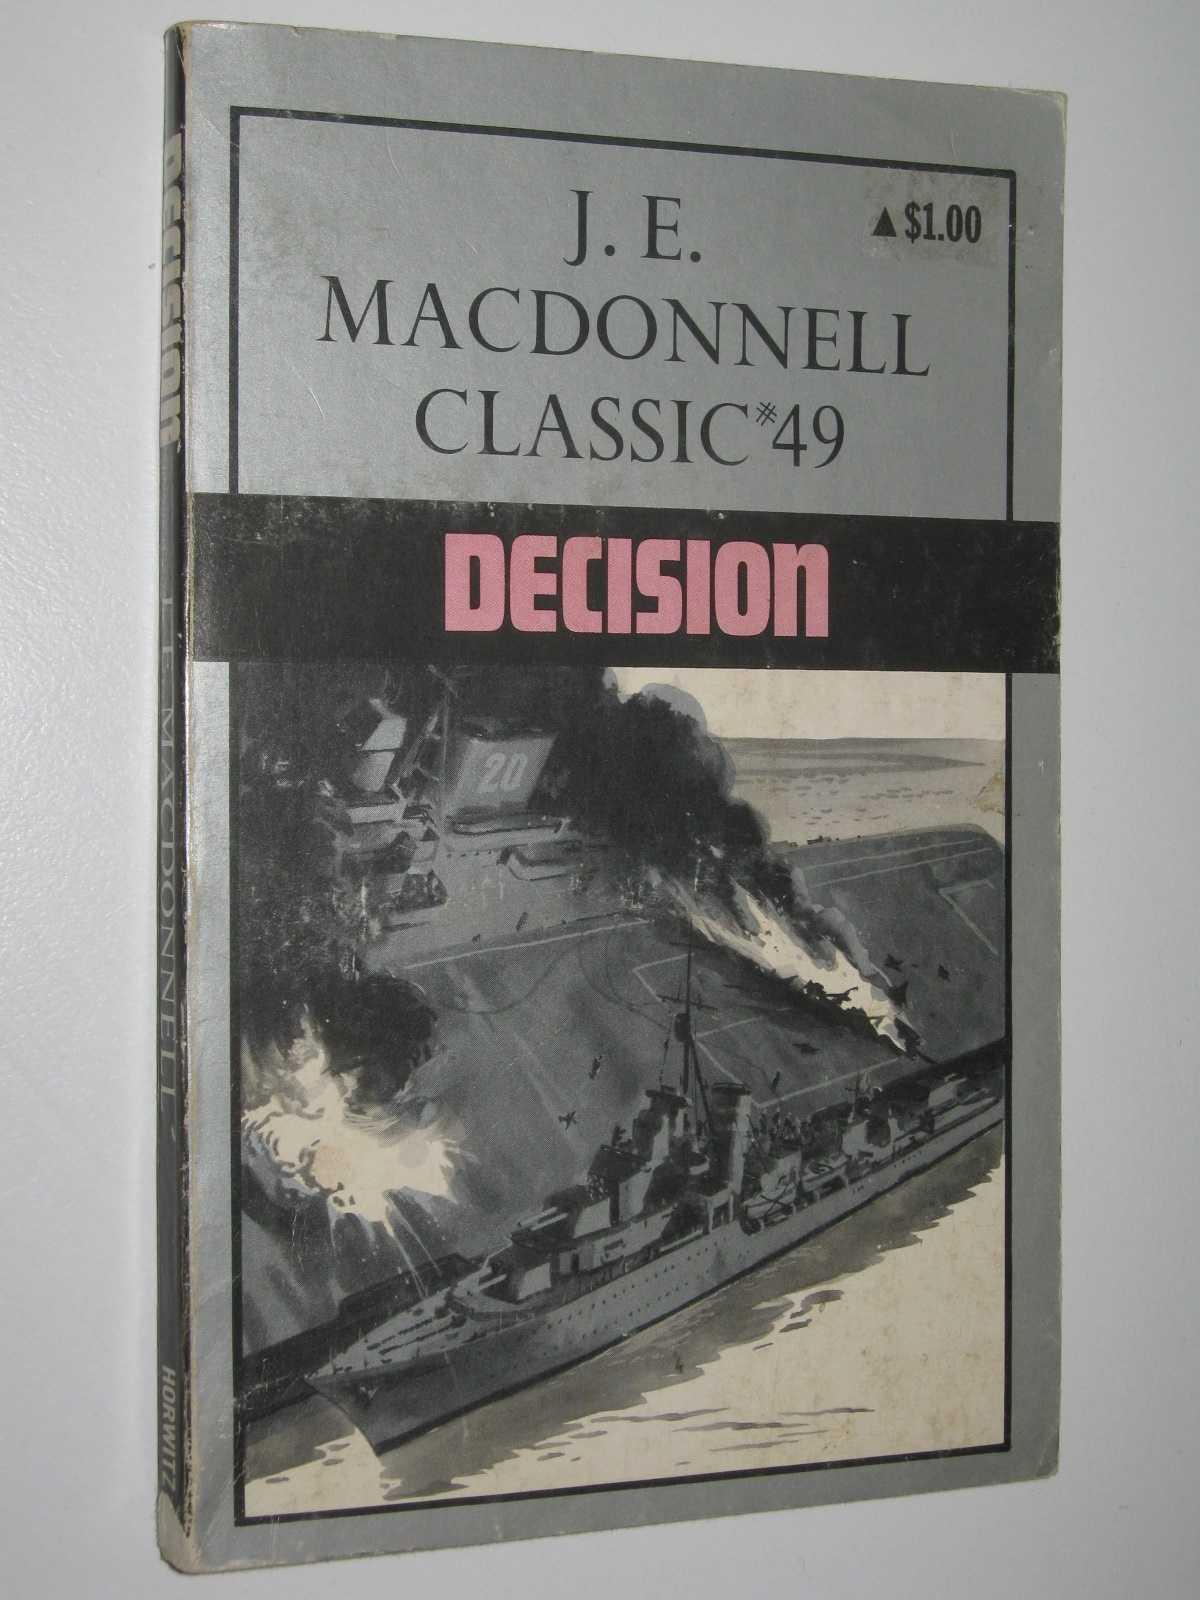 Decision - Classic Series #49, Macdonnell, J. E.